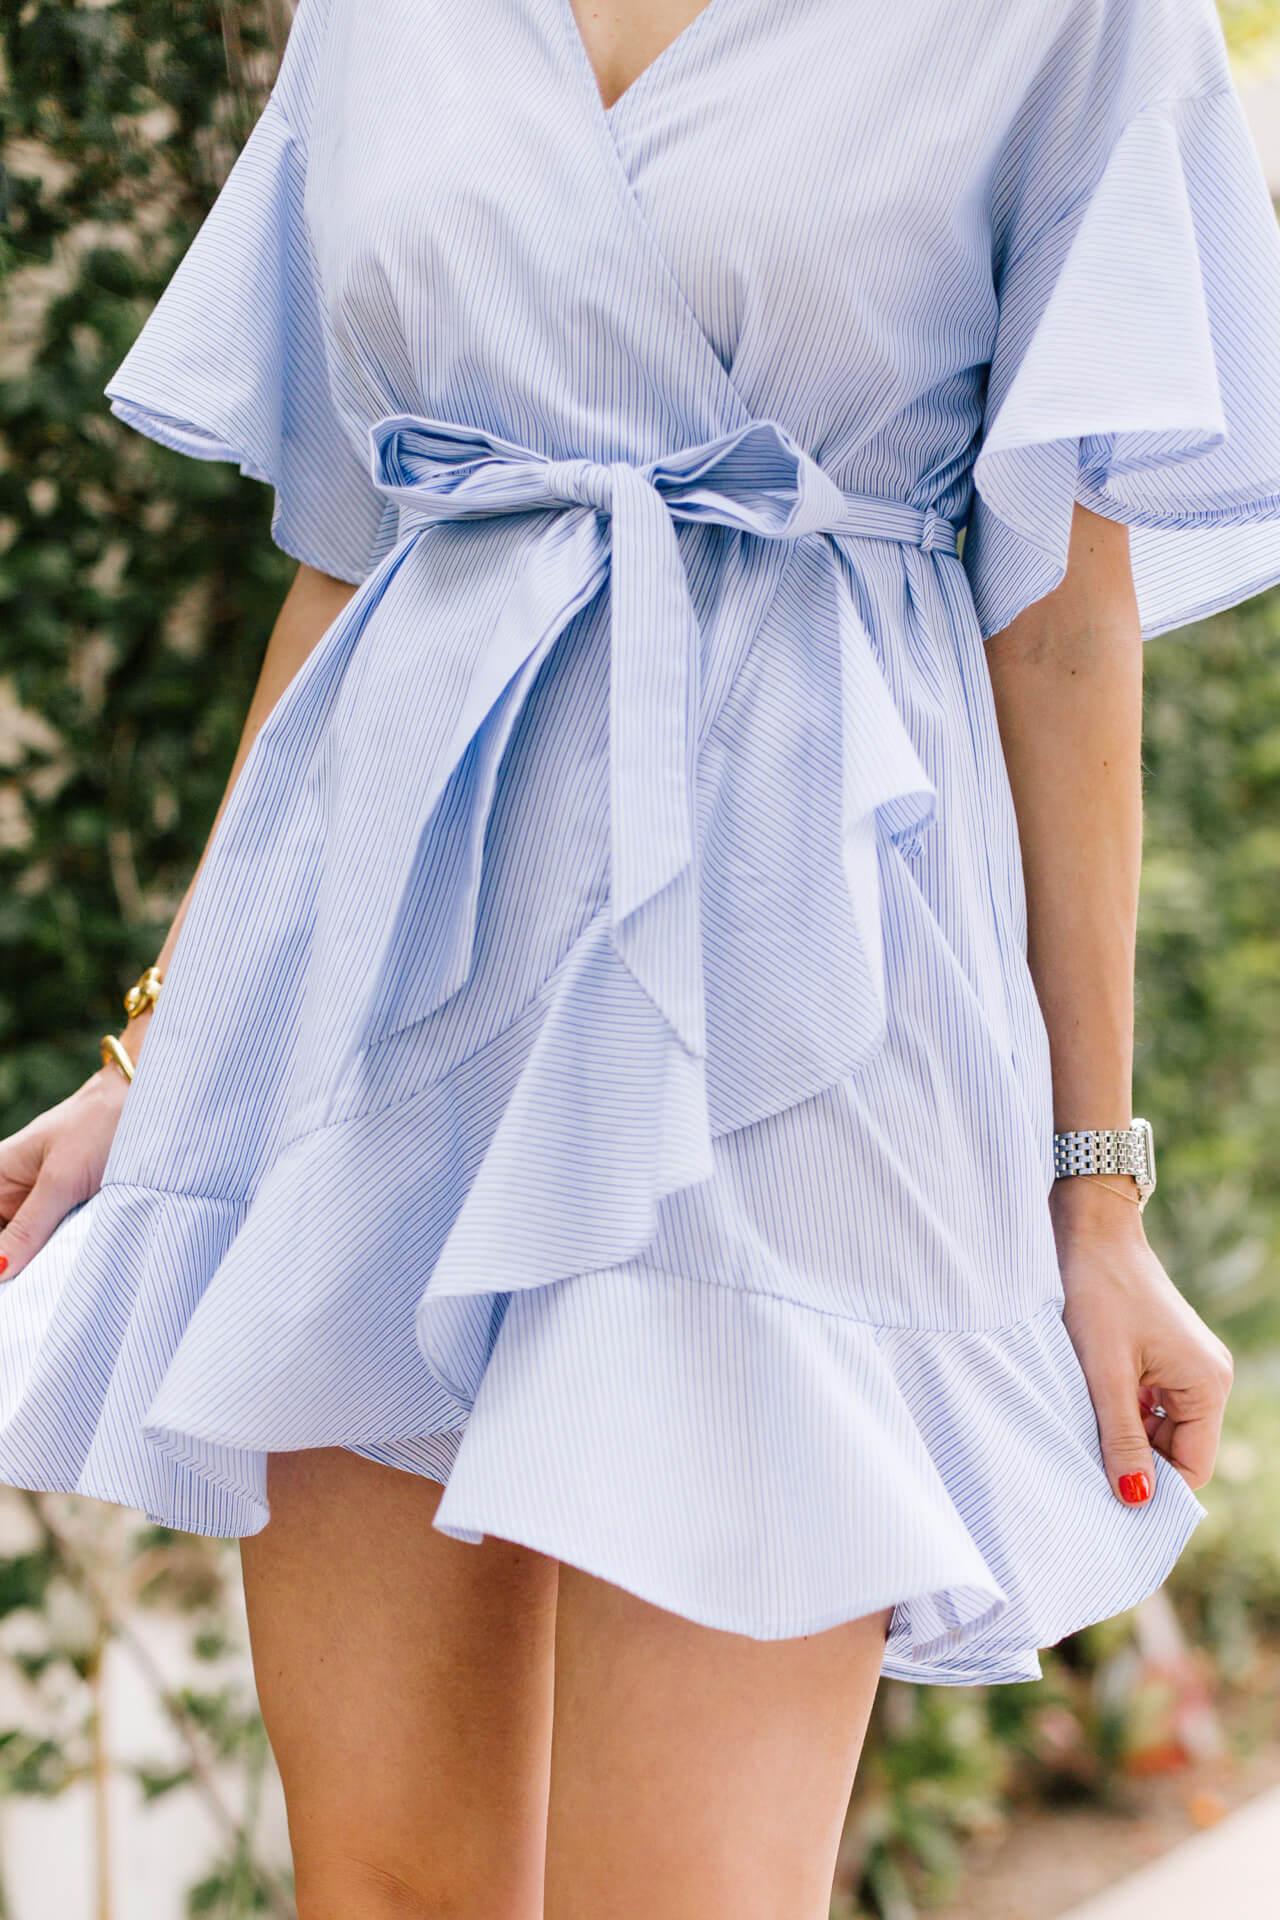 love this ruffled summer dress